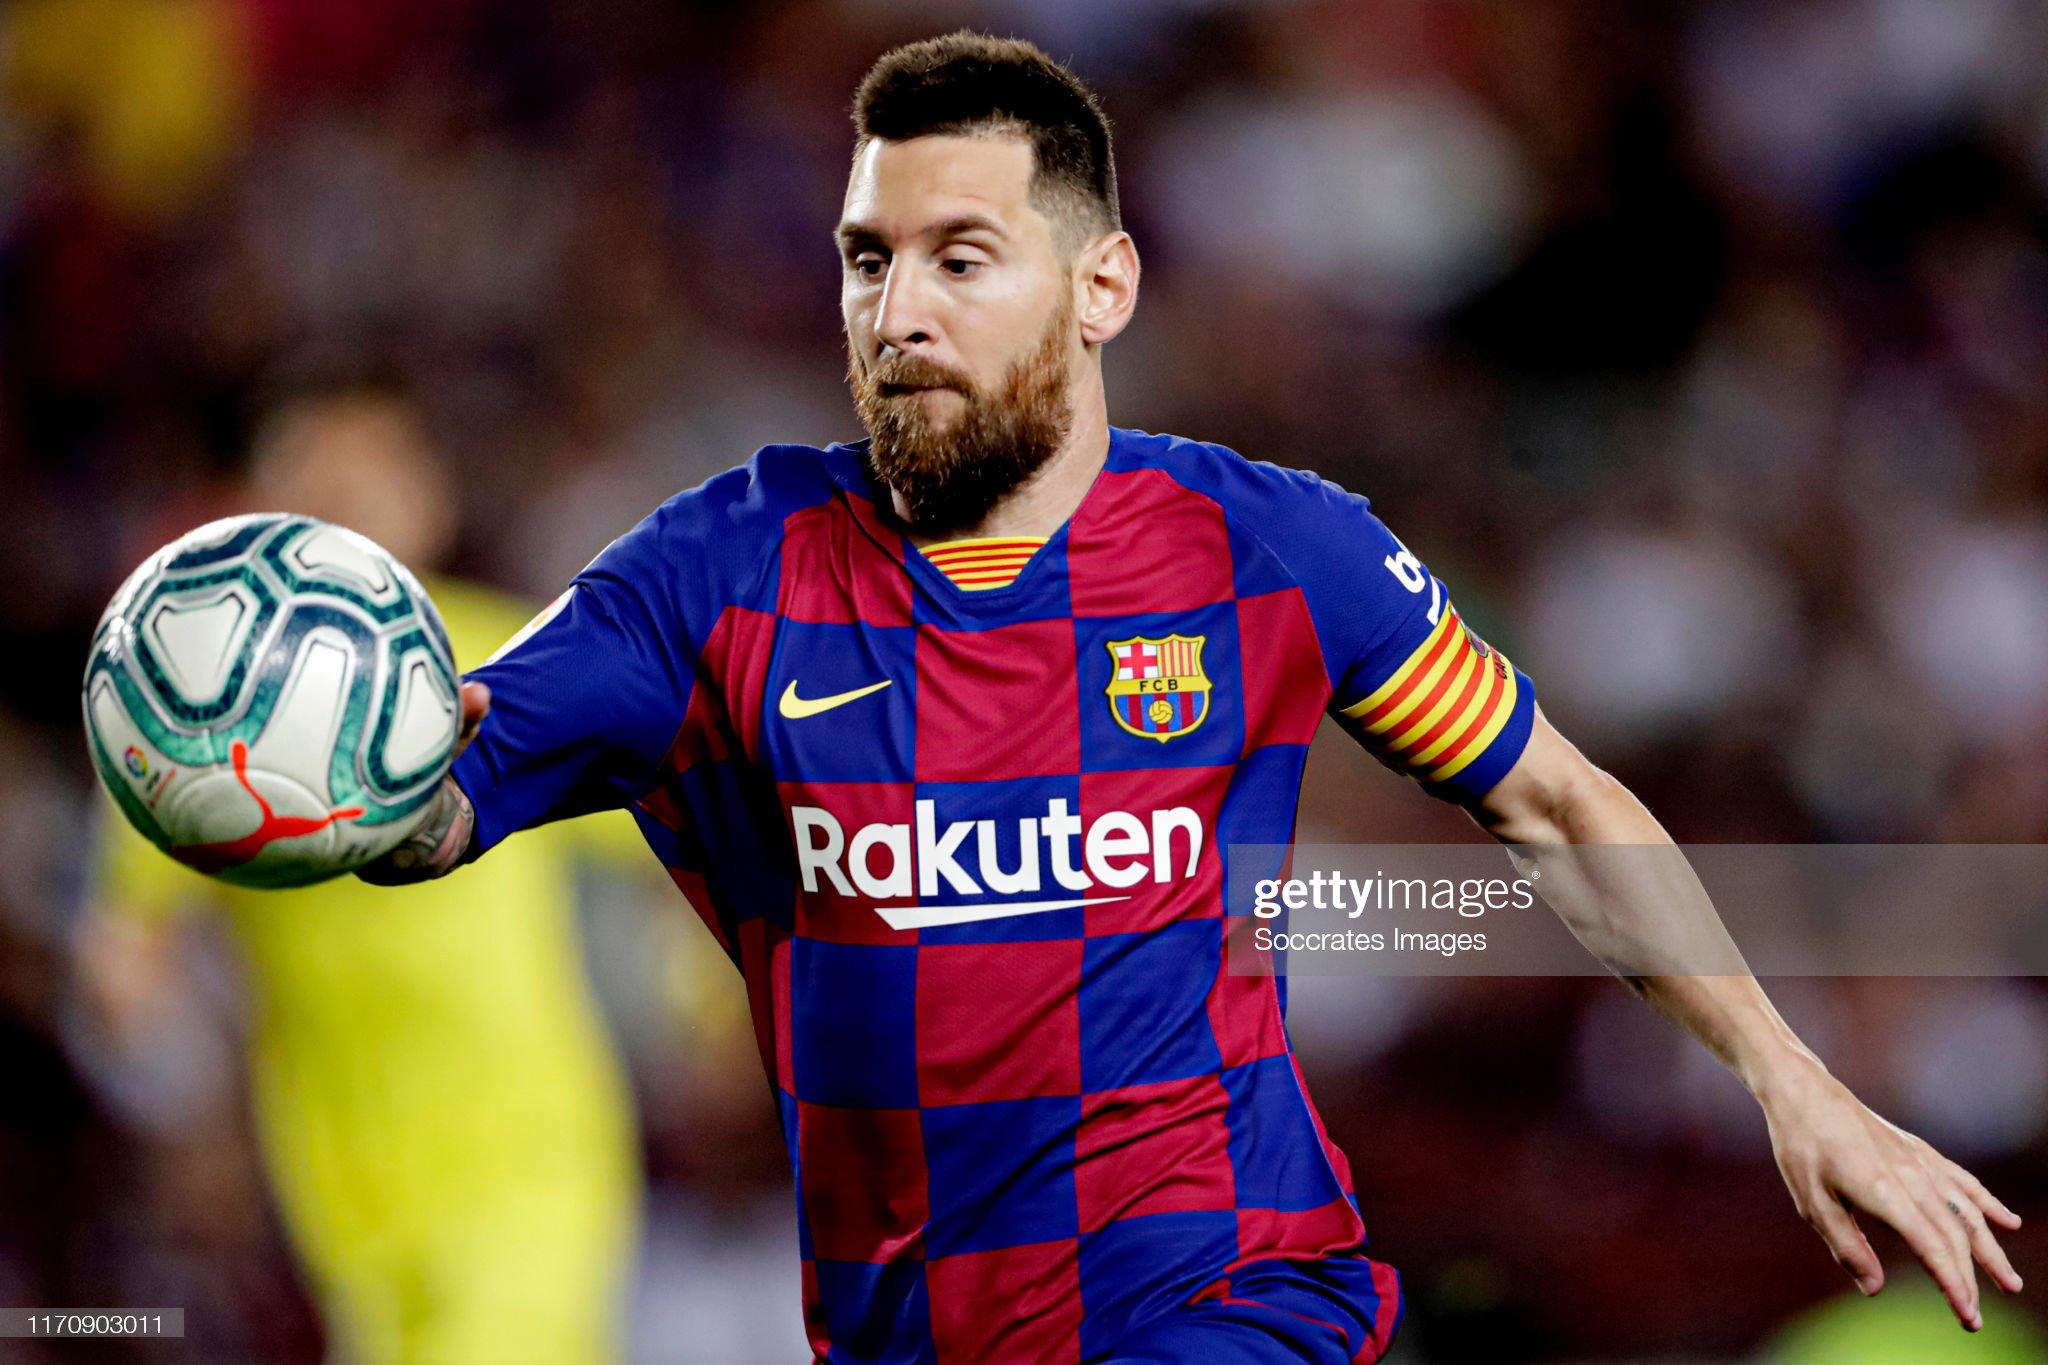 صور مباراة : برشلونة - فياريال 2-1 ( 24-09-2019 )  Lionel-messi-of-fc-barcelona-during-the-la-liga-santander-match-fc-picture-id1170903011?s=2048x2048